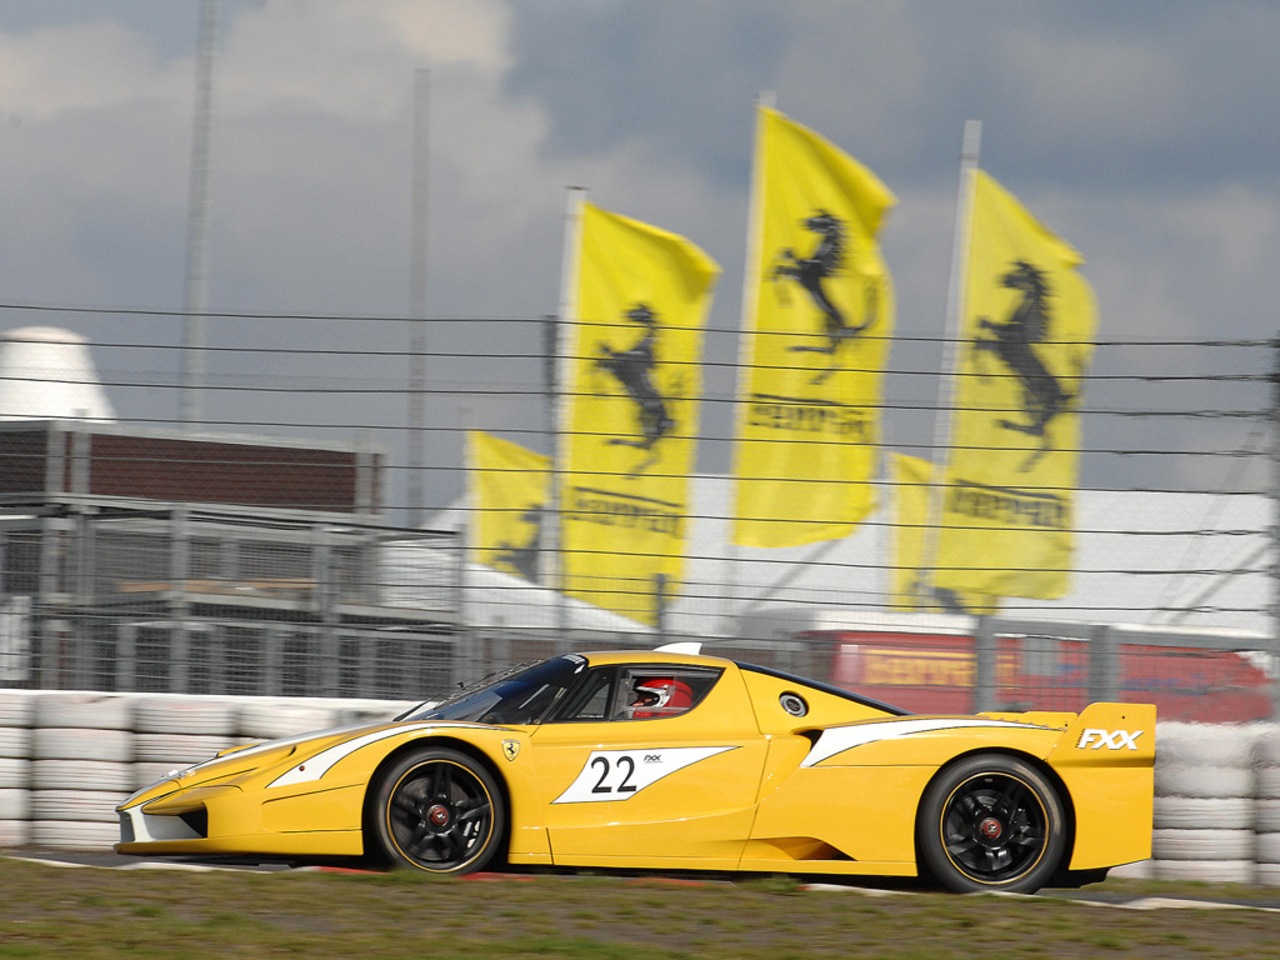 FXX Prototype at Nuerburgring circuit